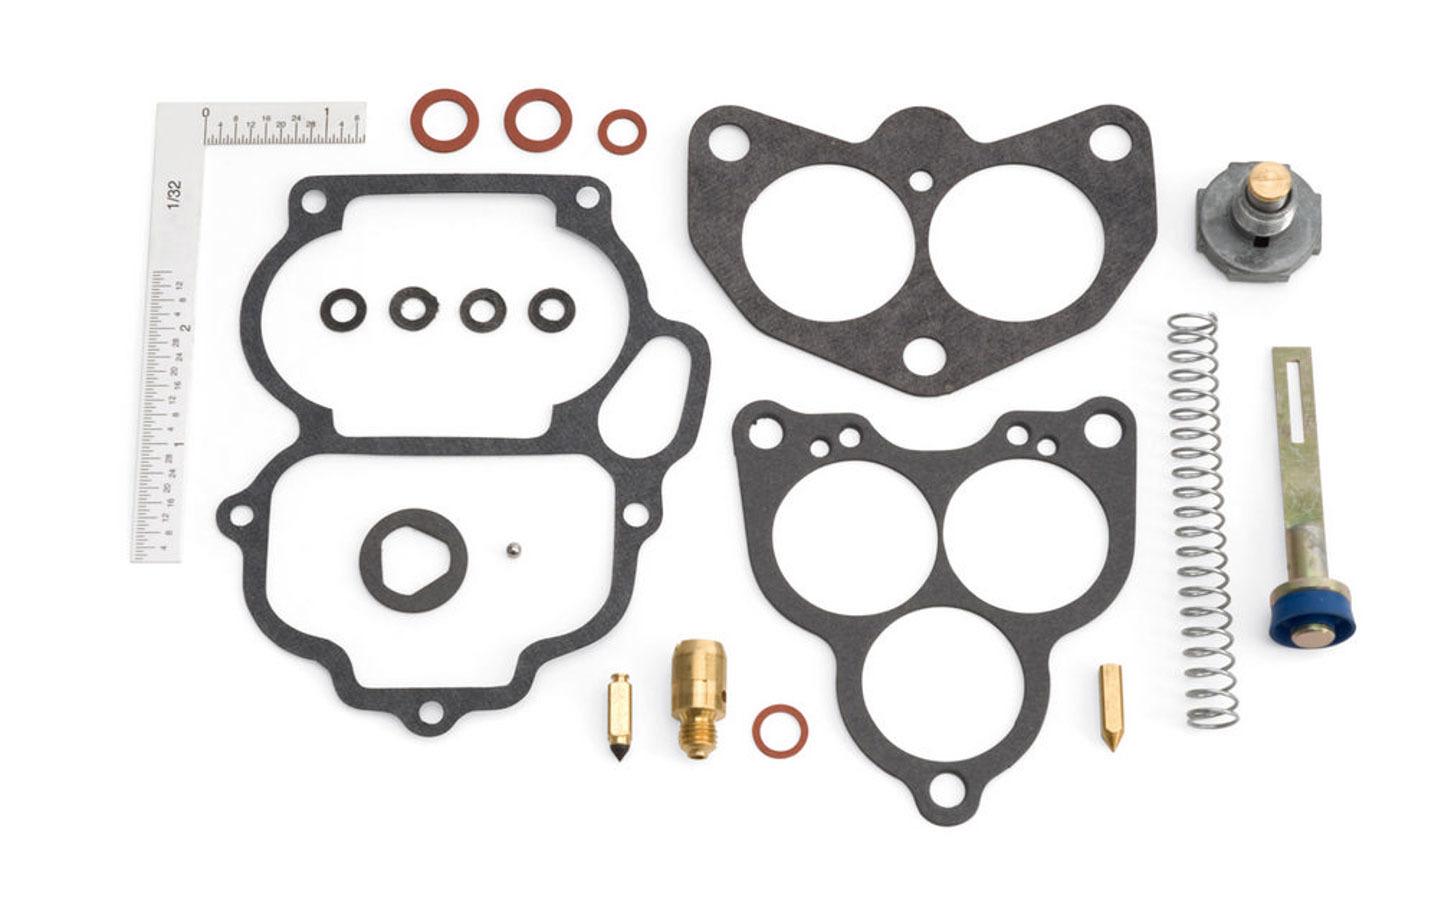 Edelbrock 1154 Carburetor Rebuild Kit, Edelbrock 94 Carburetors, Gas, Kit